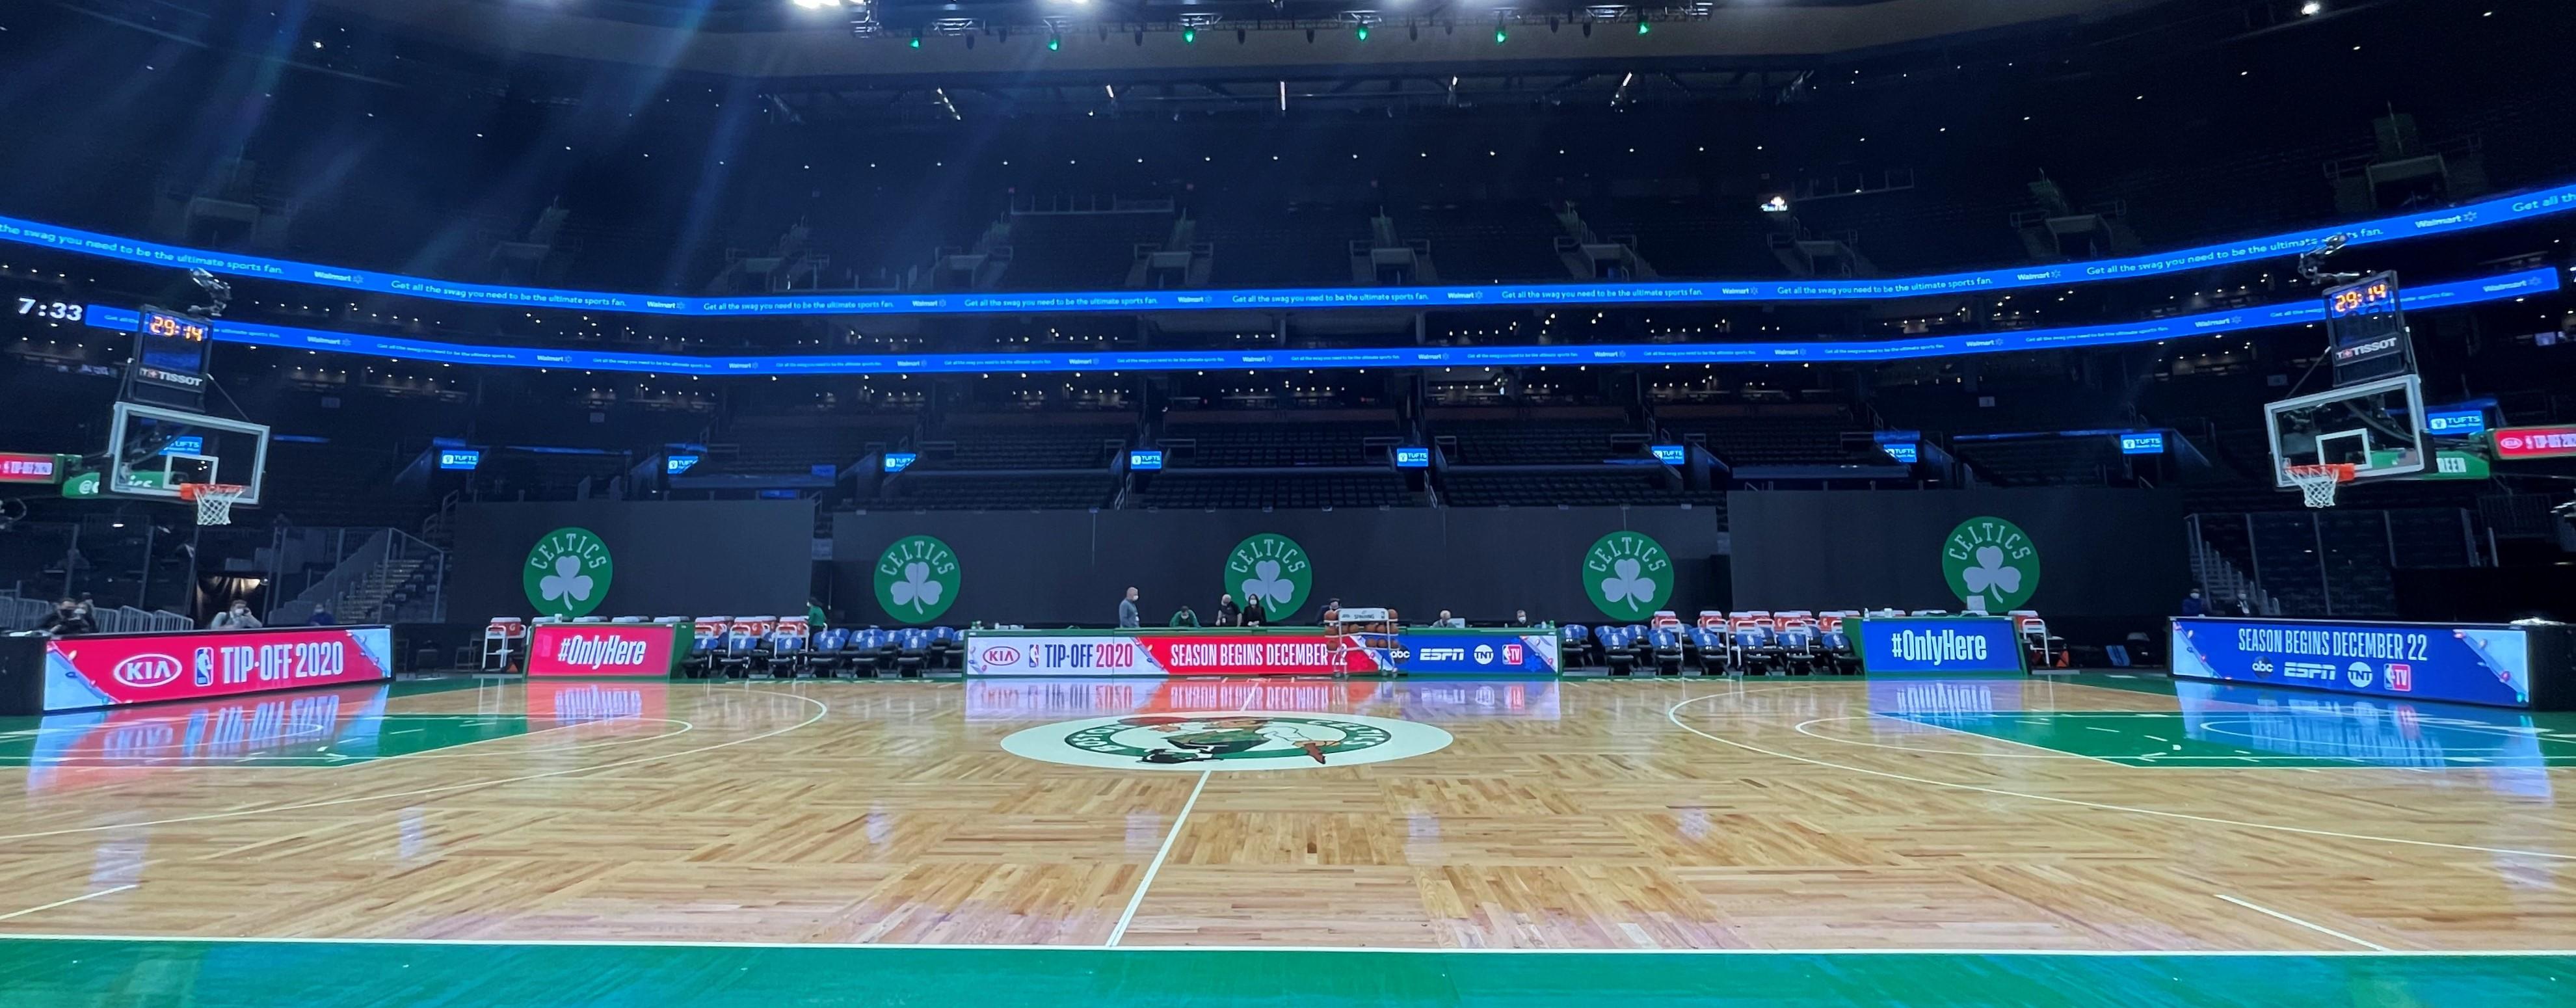 Boston Celtics Courtside System